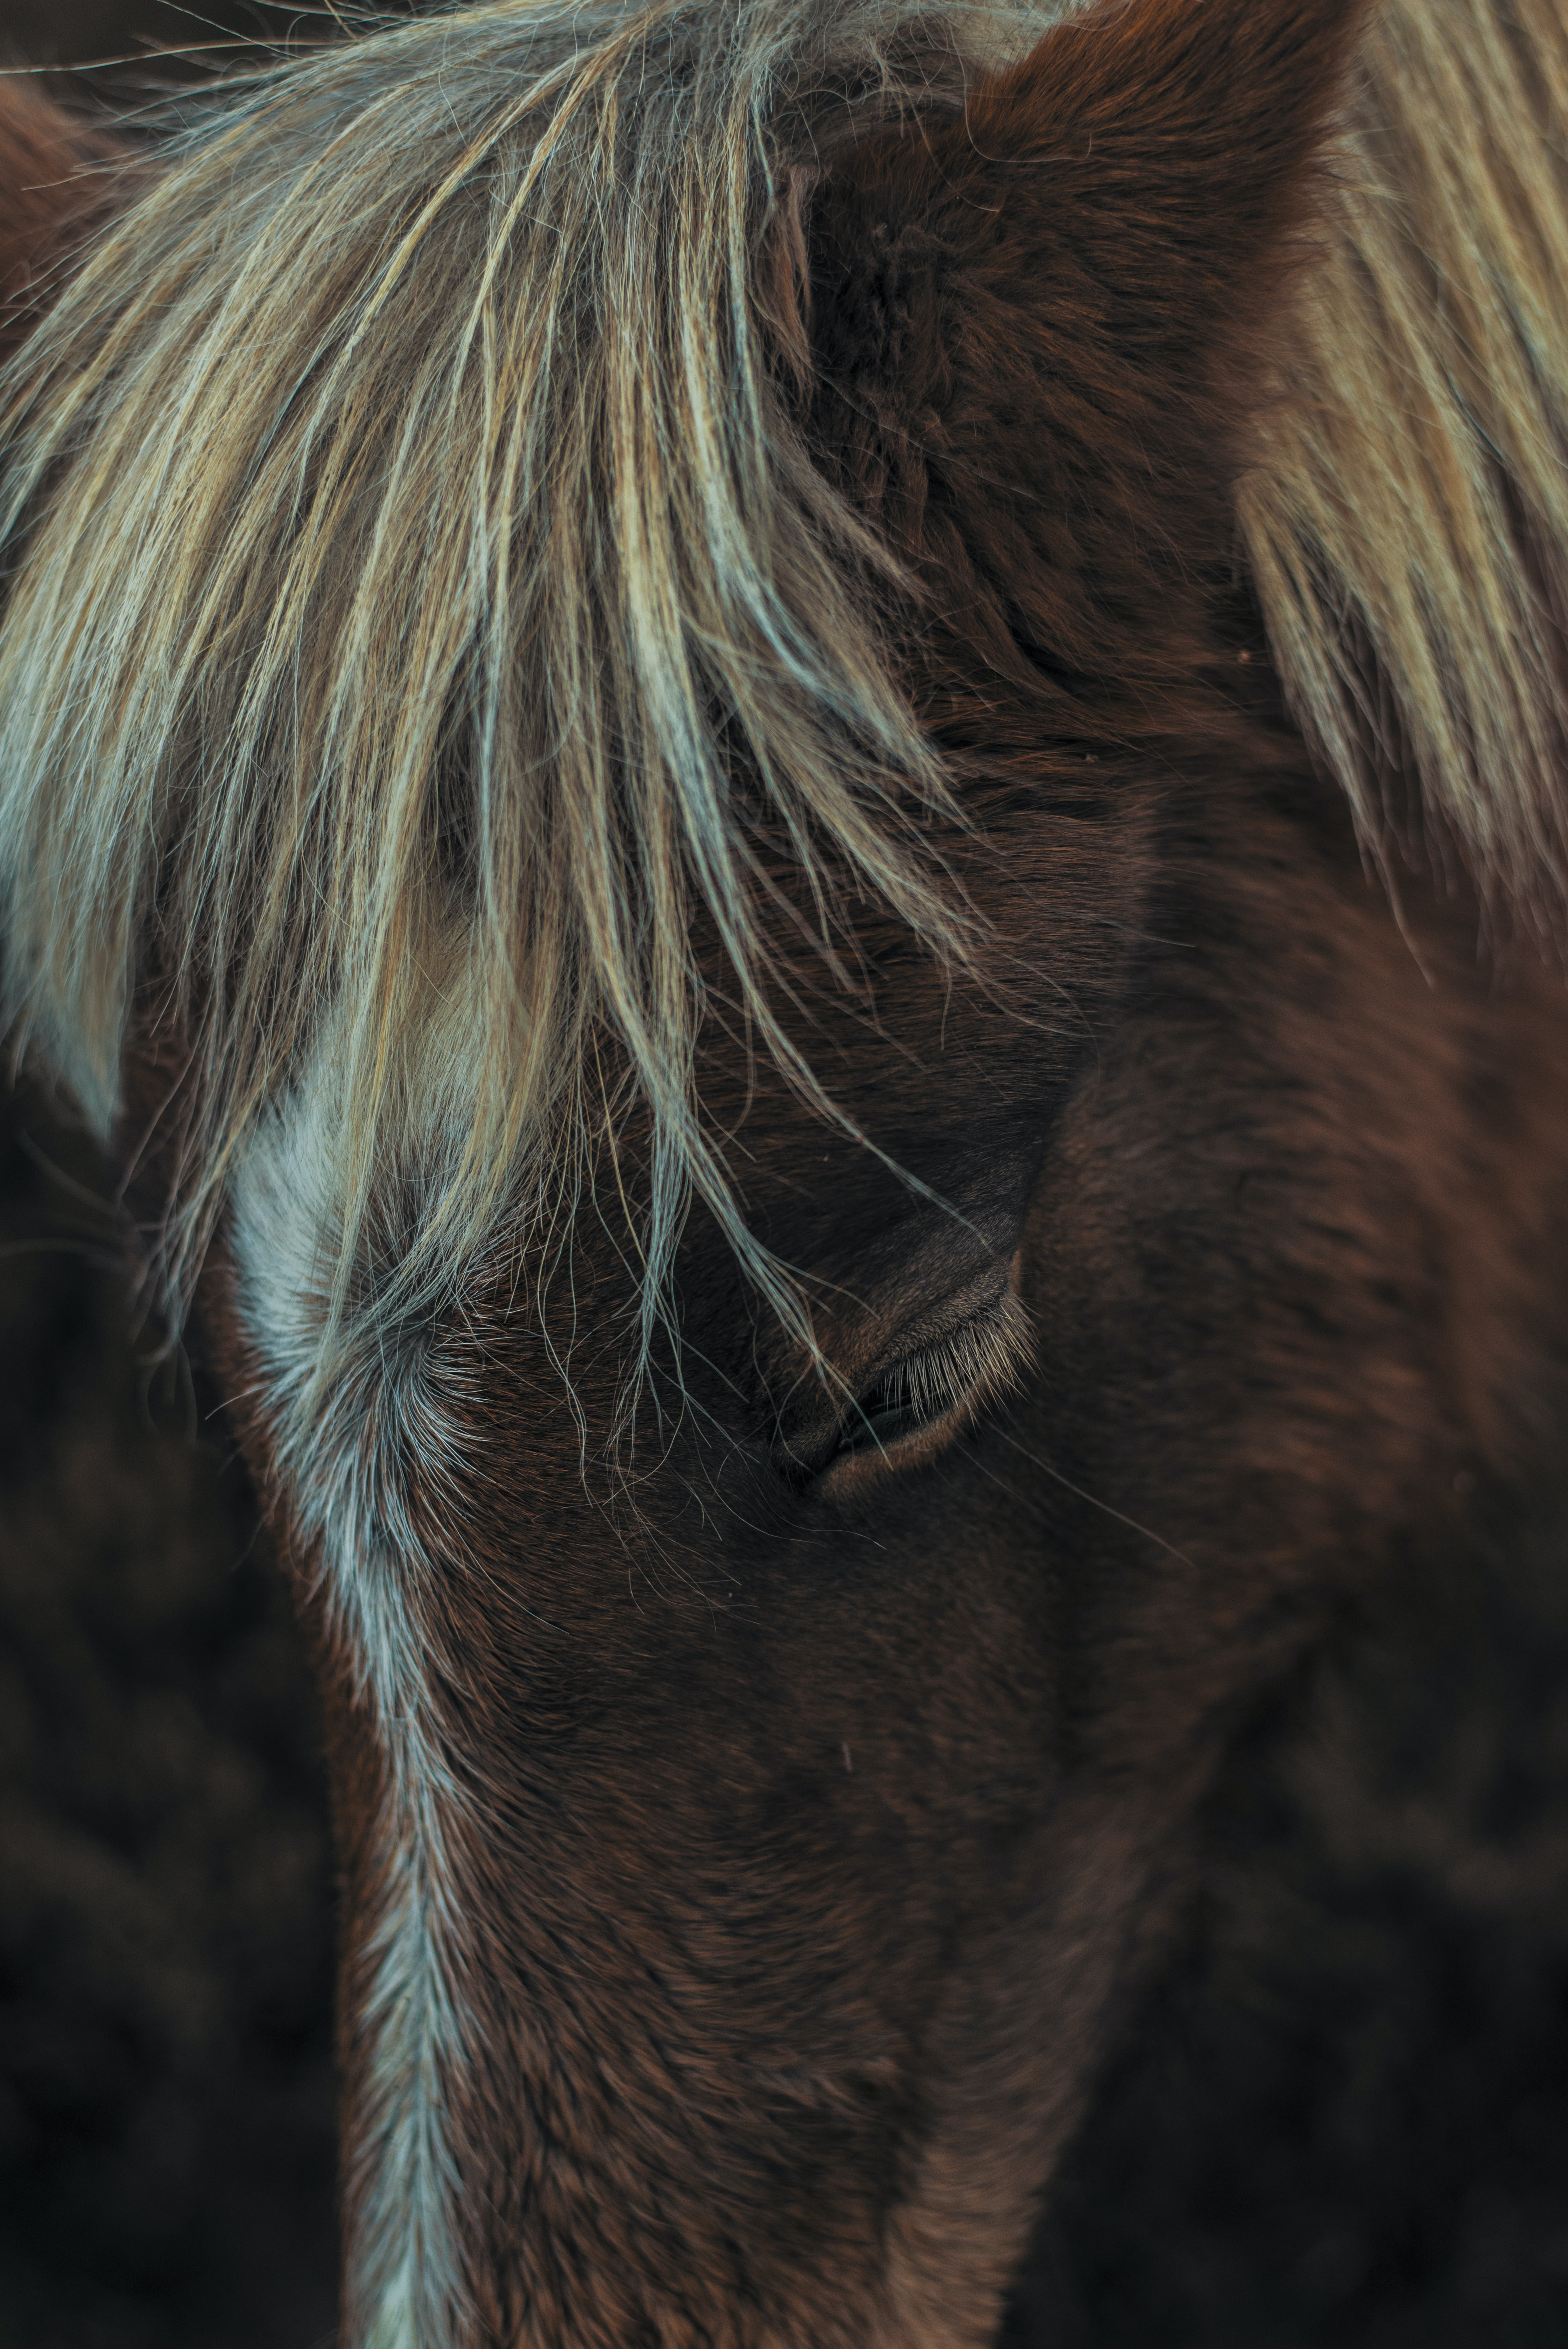 tilt shift photography of a foal